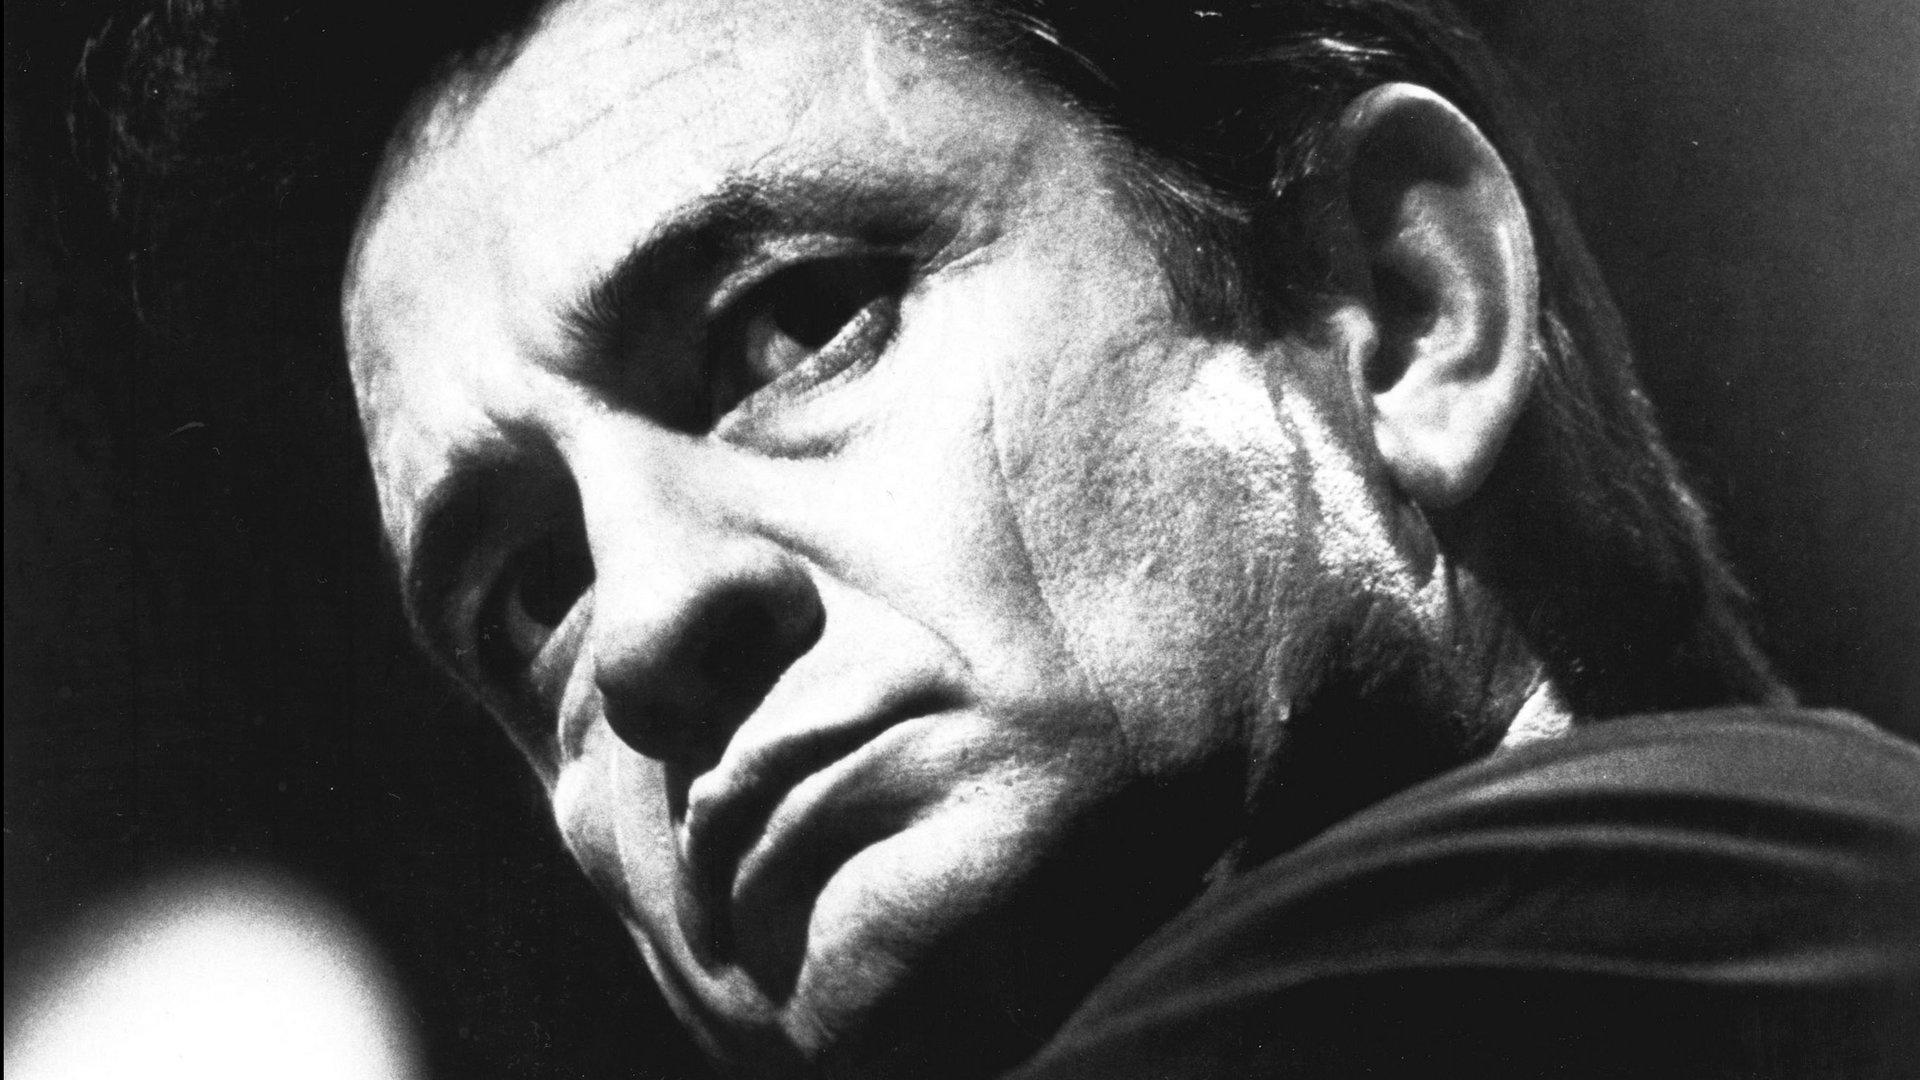 Johnny Cash Widescreen for desktop